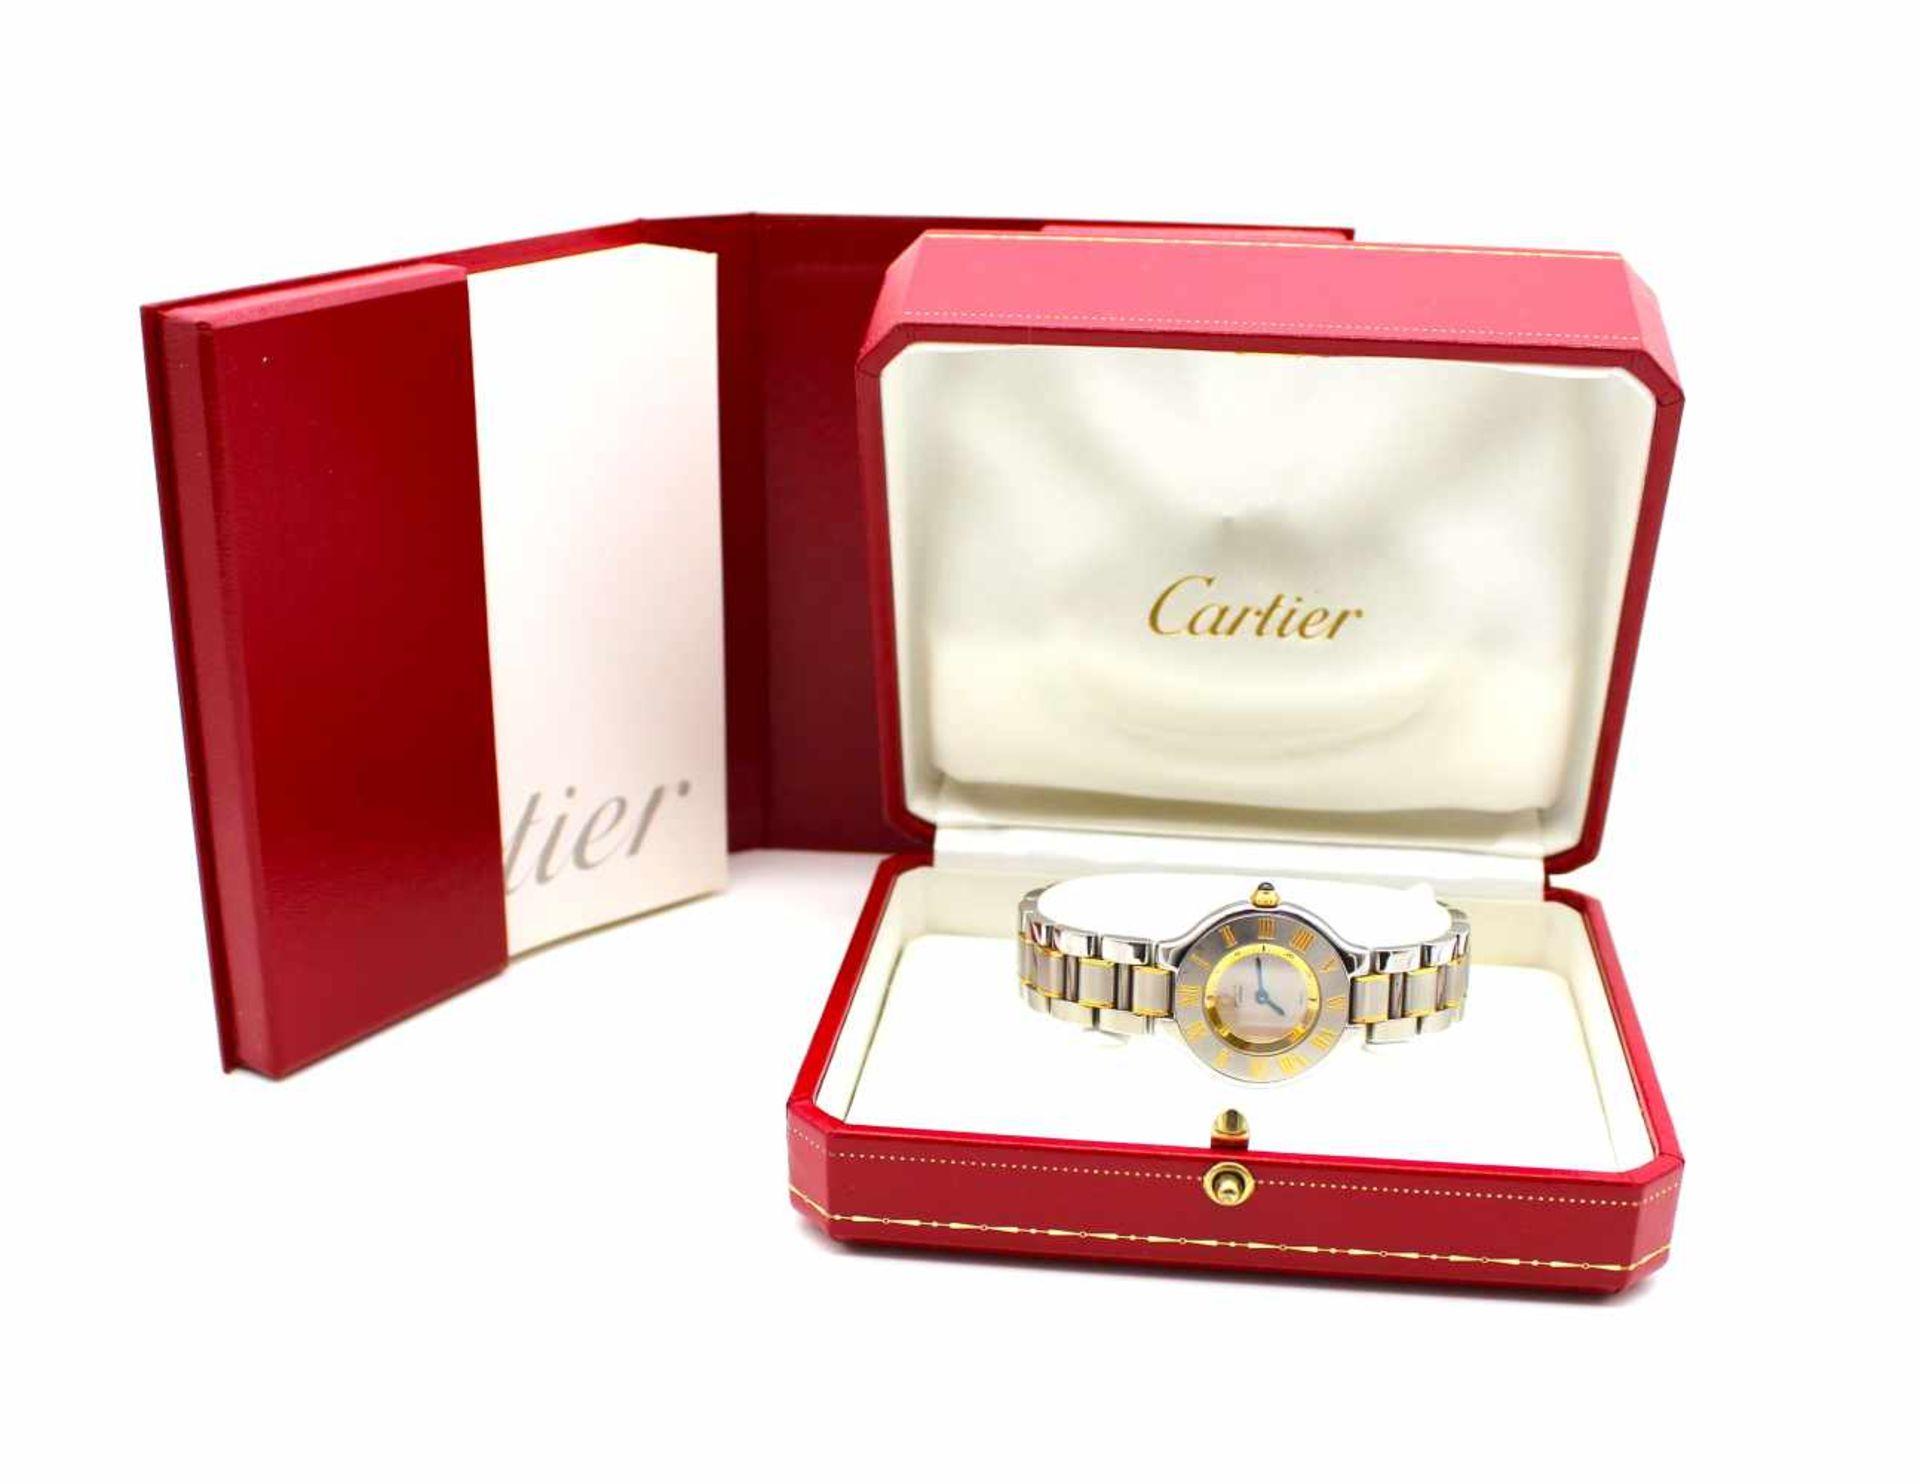 Los 17 - Cartier Damenarmbanduhr Stahl Gold Must de Cartier 21 mit Box